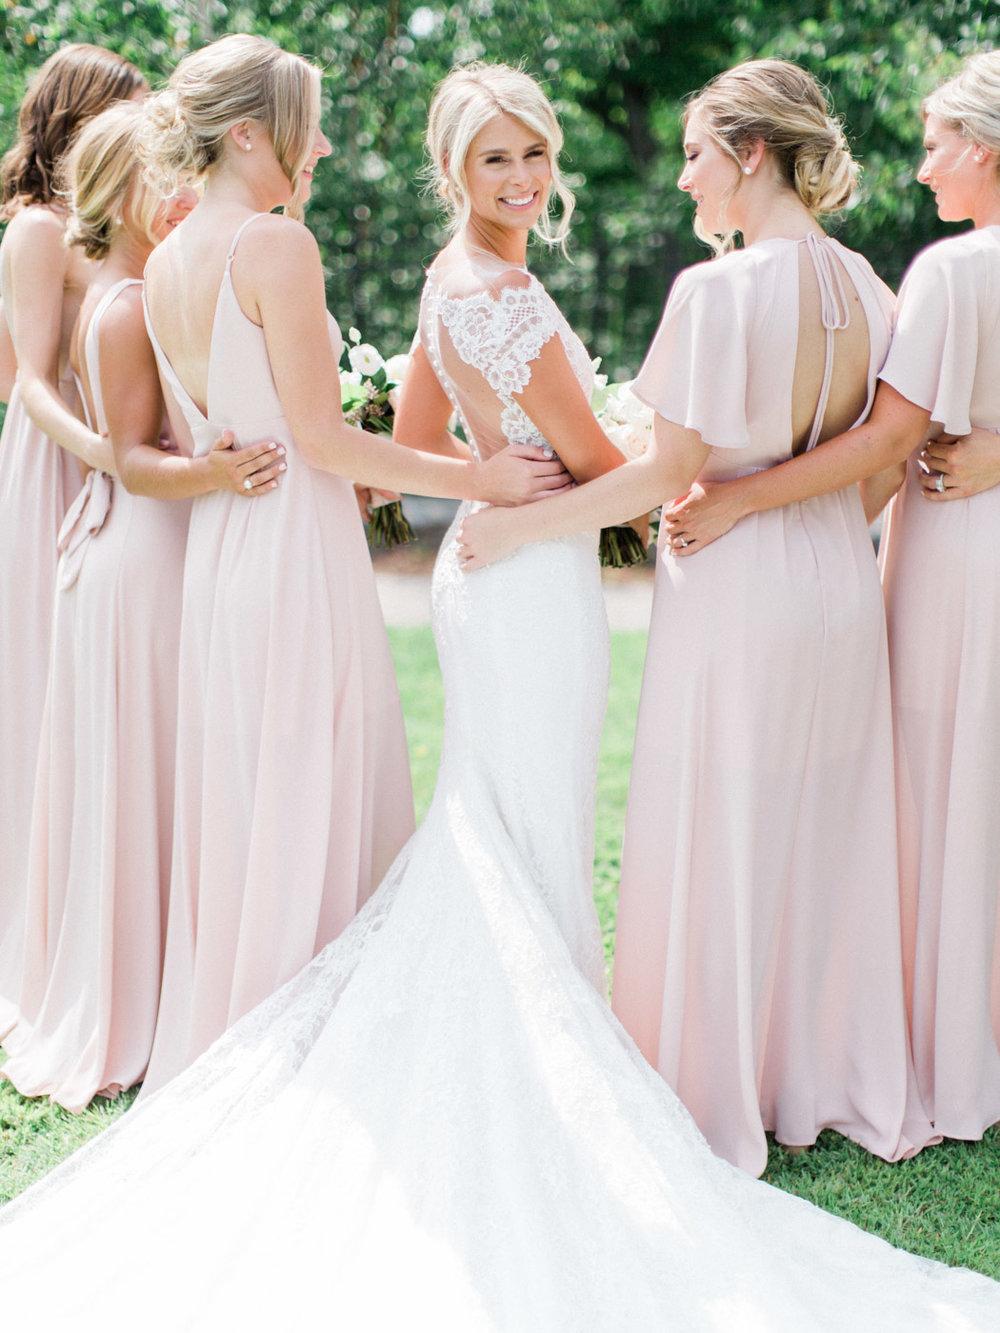 Toronto-Muskoka-wedding-photographer-summery-fun-documentary-the-marriott-rosseau48.jpg